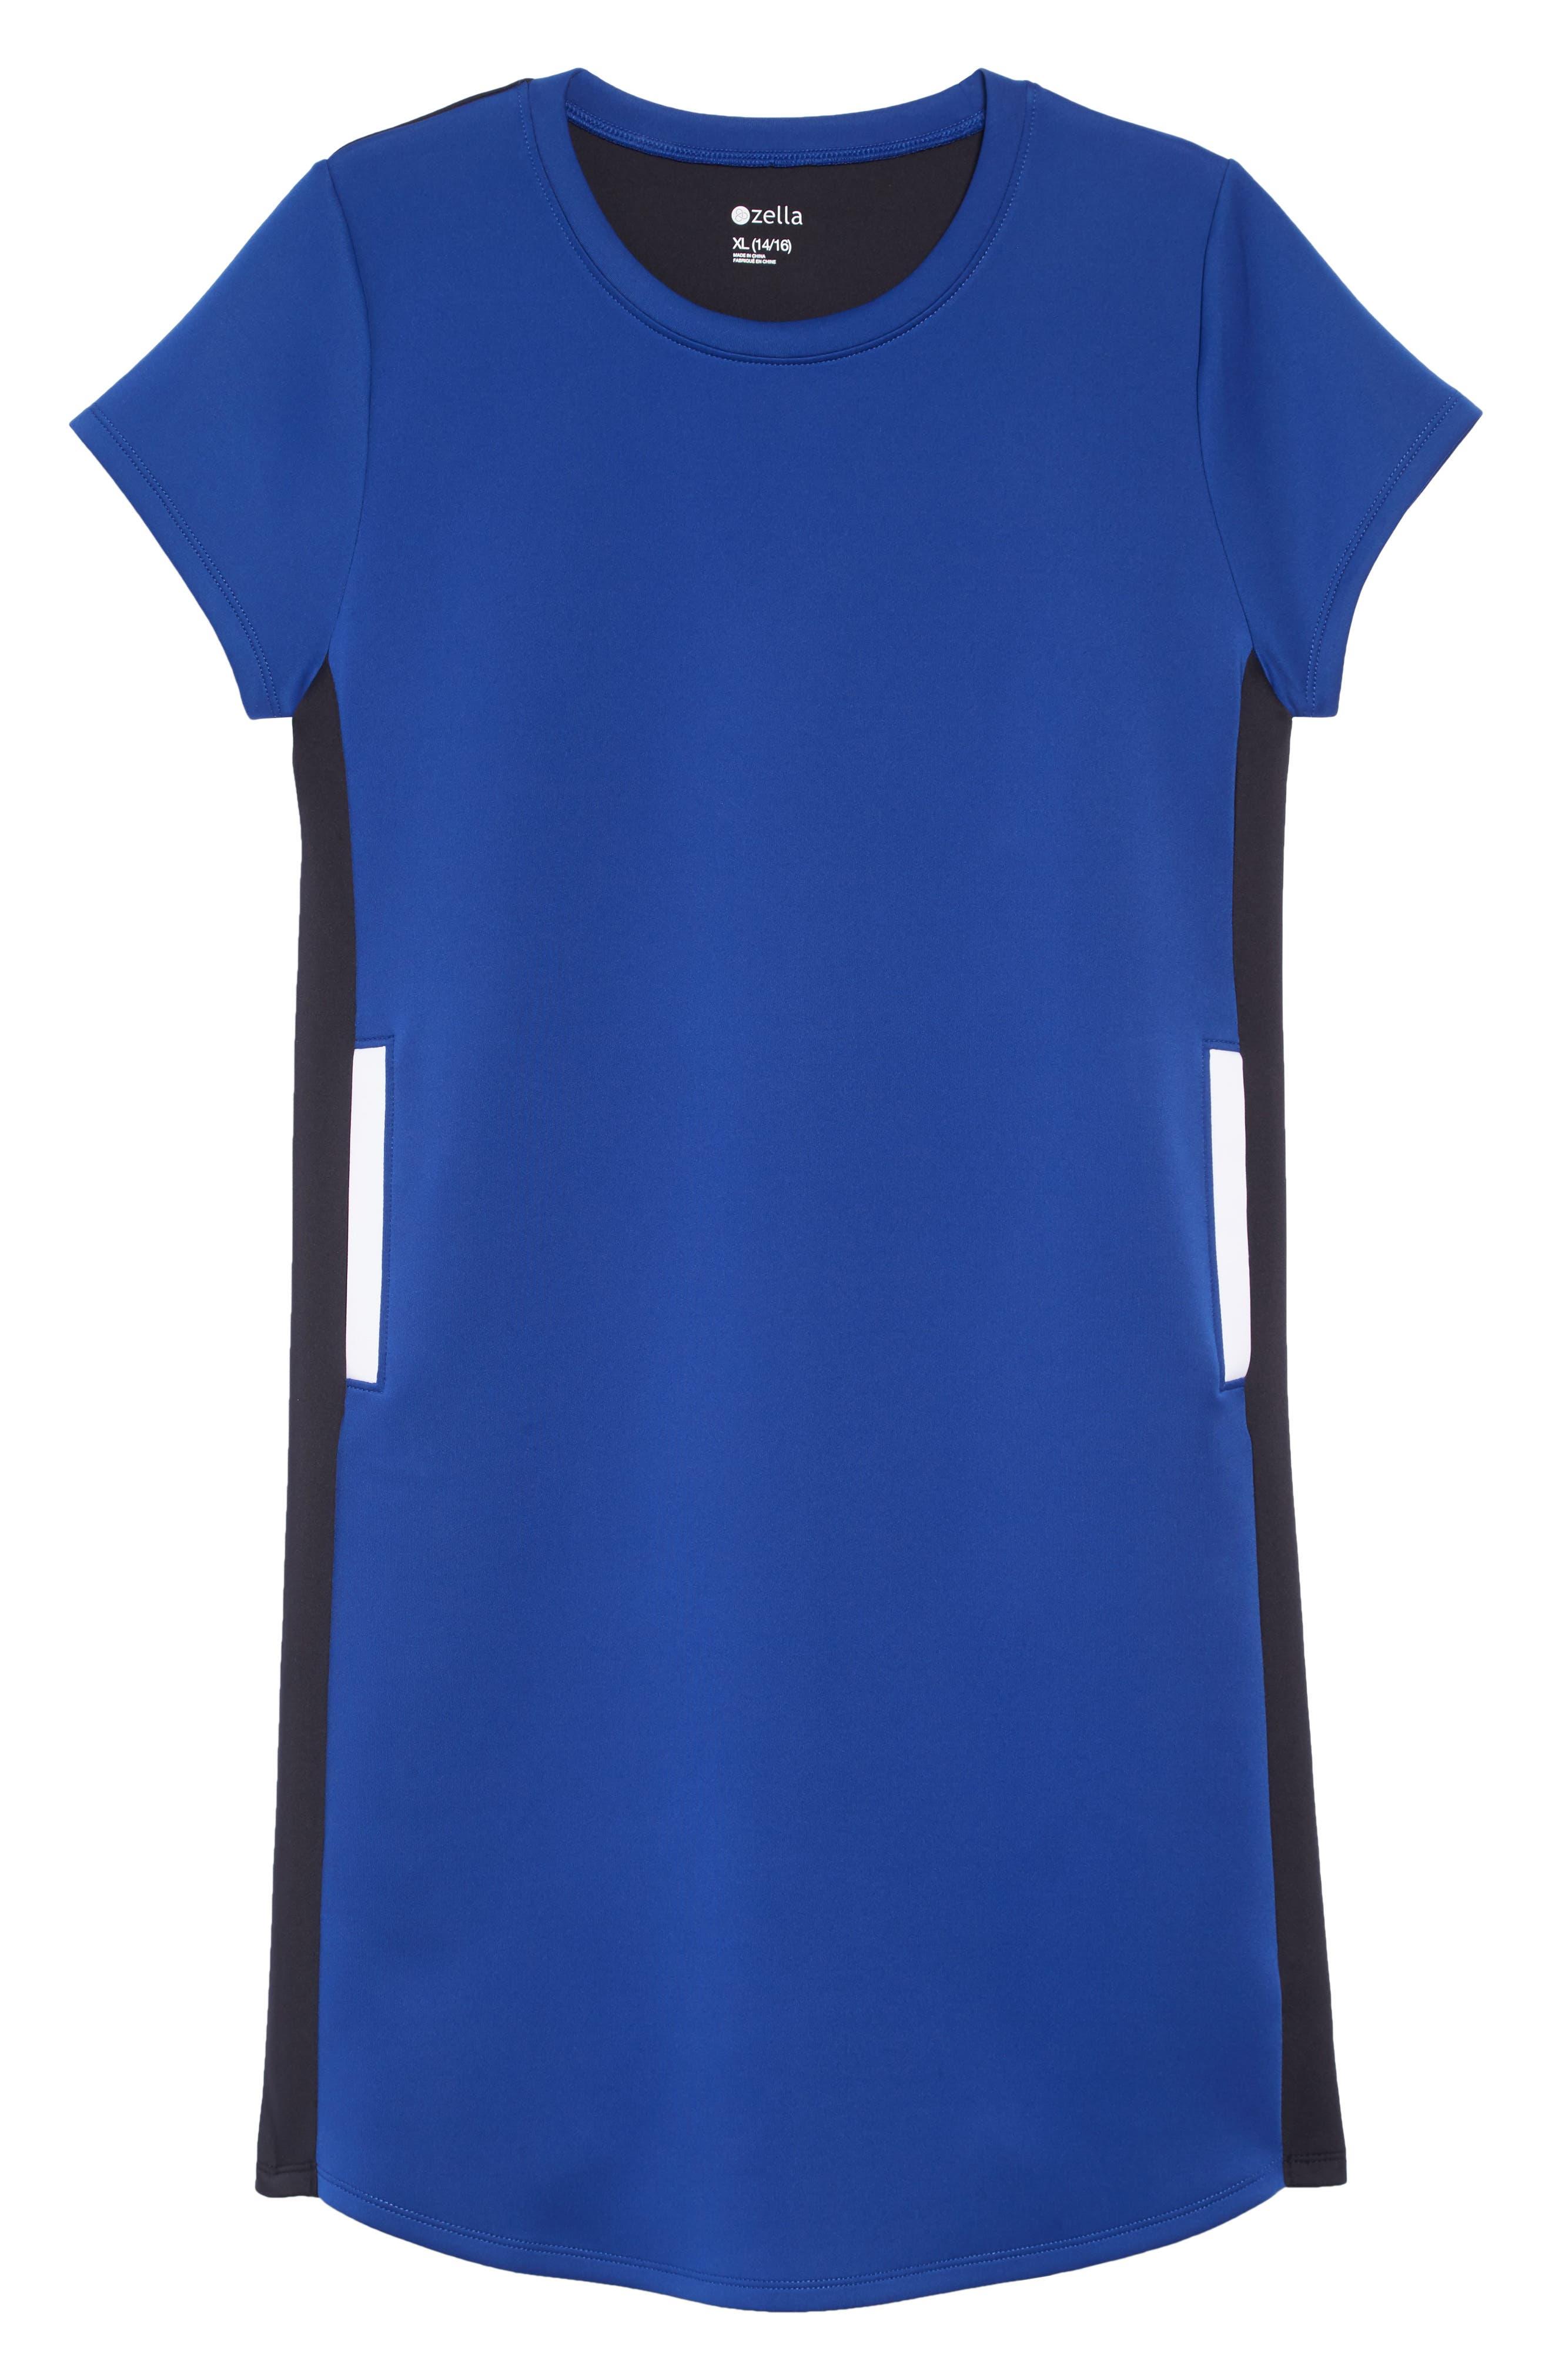 ZELLA GIRL,                             Colorblock Dress,                             Main thumbnail 1, color,                             401